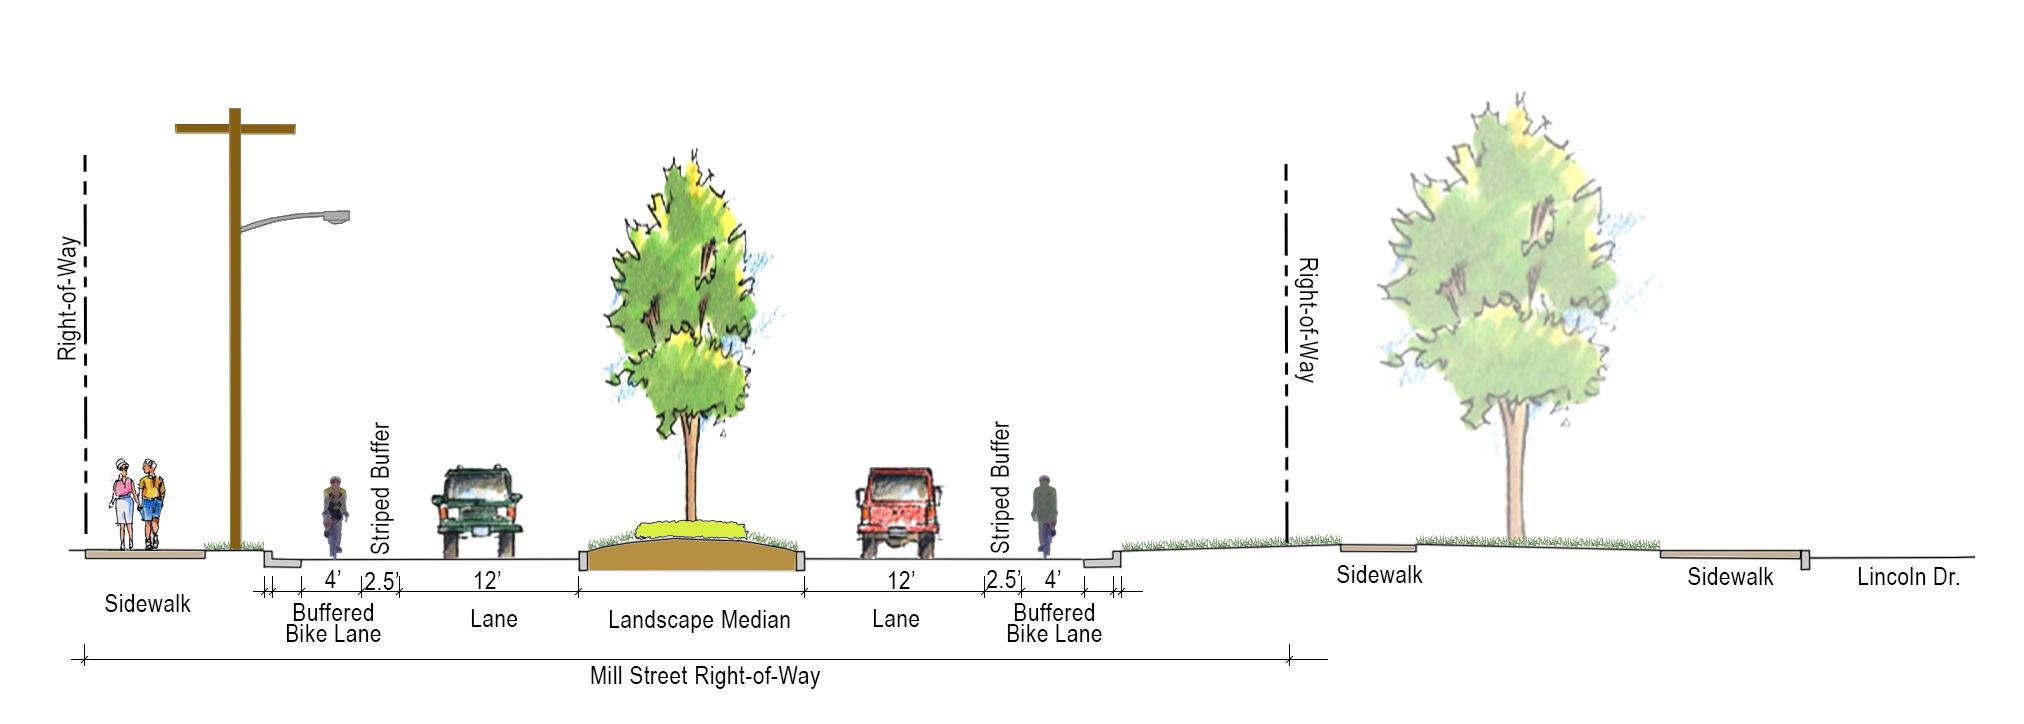 16-1-3-Mill Street Cross Sections_Option 1 - 10'Scale.jpg